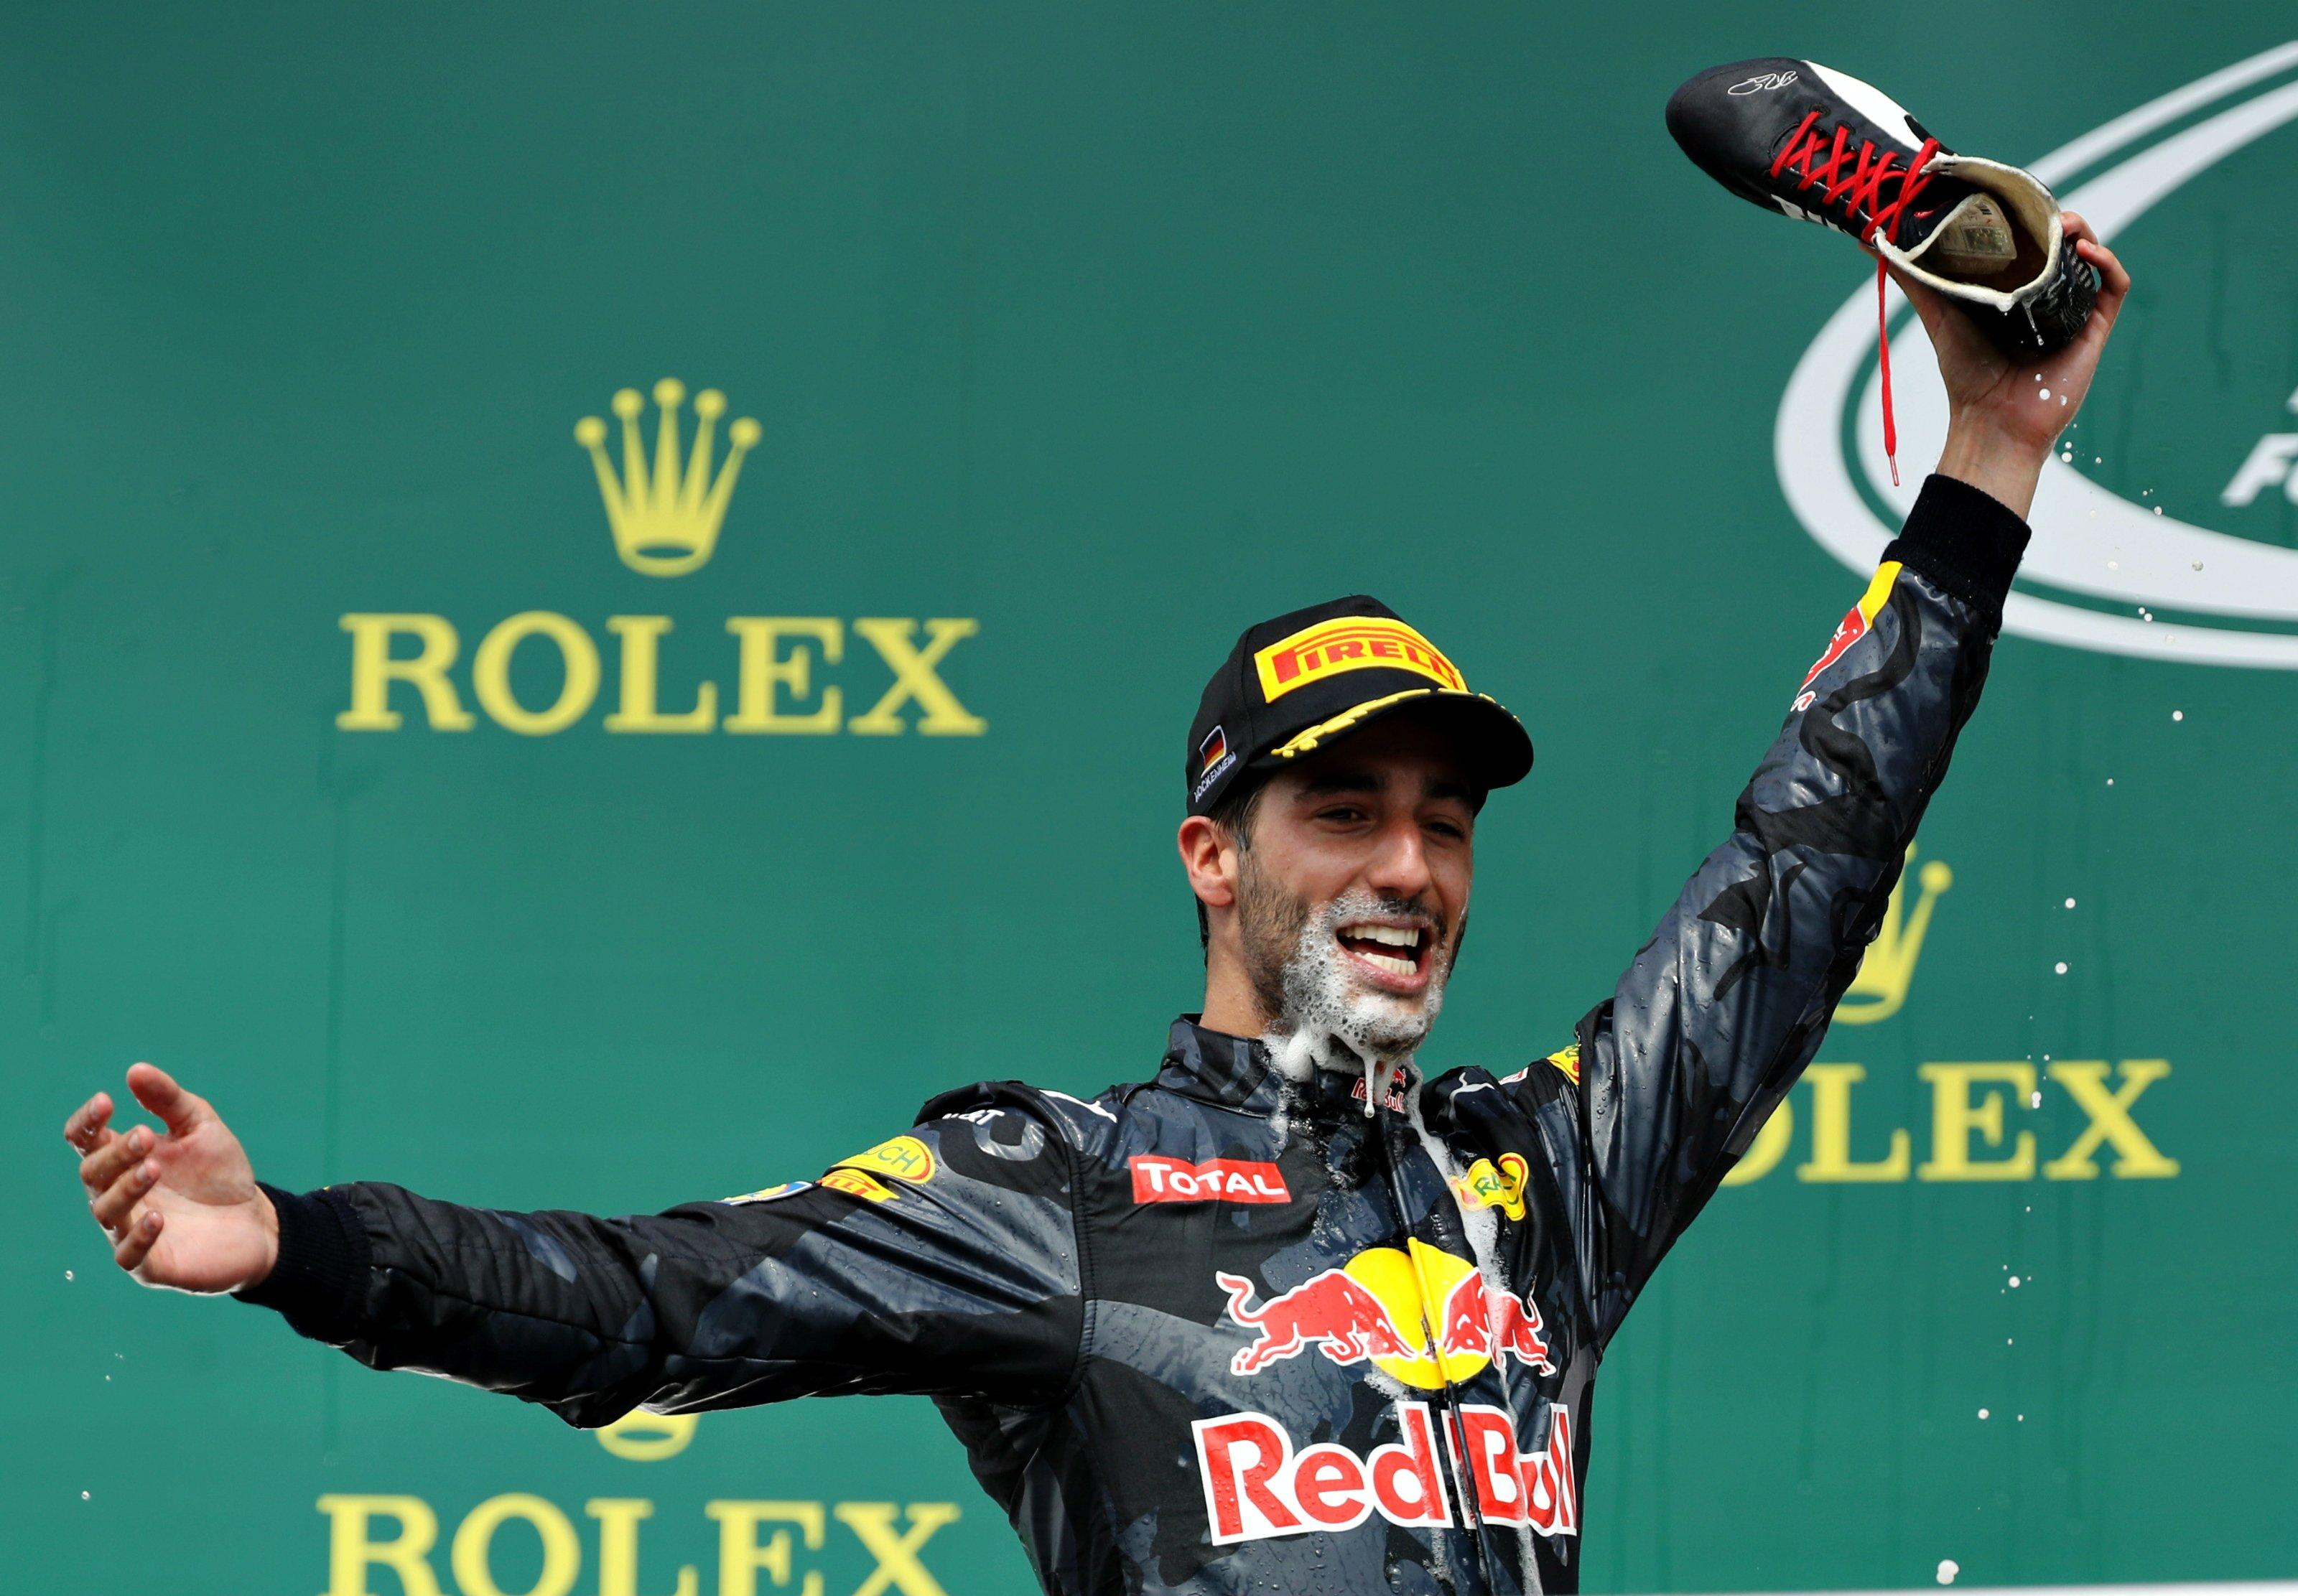 Danny Ricciardo of Red Bull on the podium at the 2016 German Grand Prix